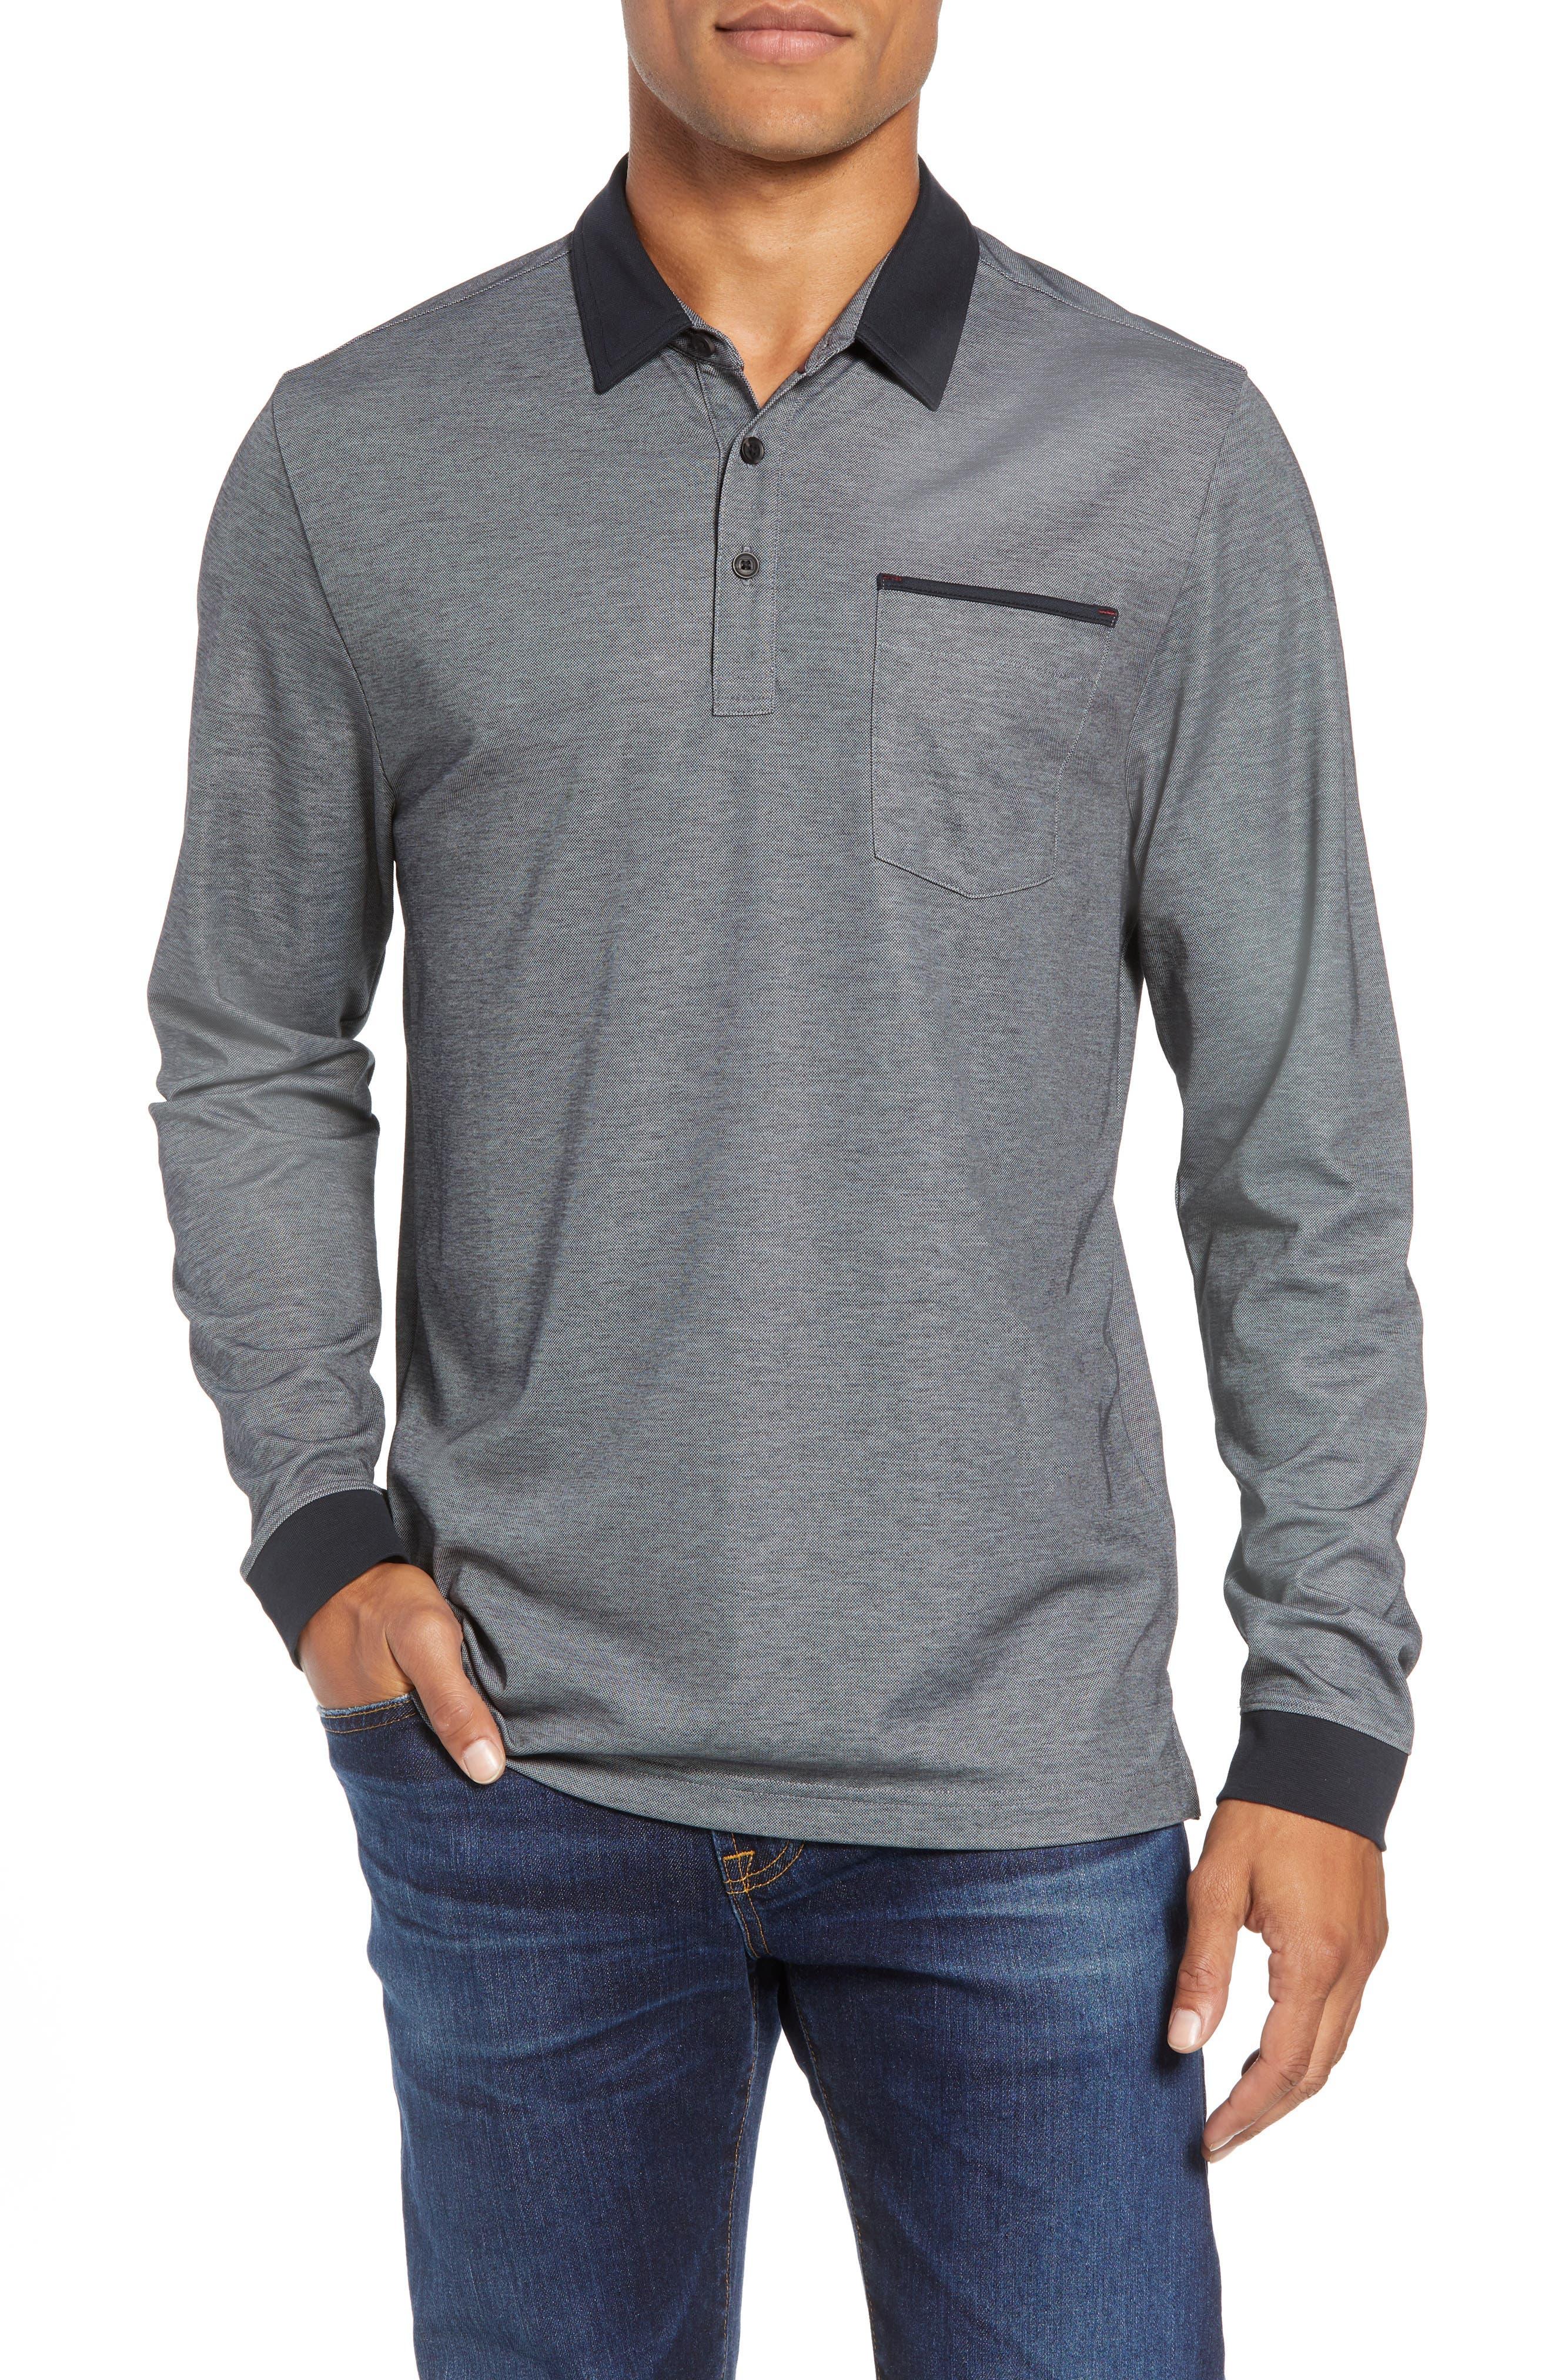 Kay Regular Fit Long Sleeve Polo Shirt,                             Main thumbnail 1, color,                             HEATHER CASTLEROCK